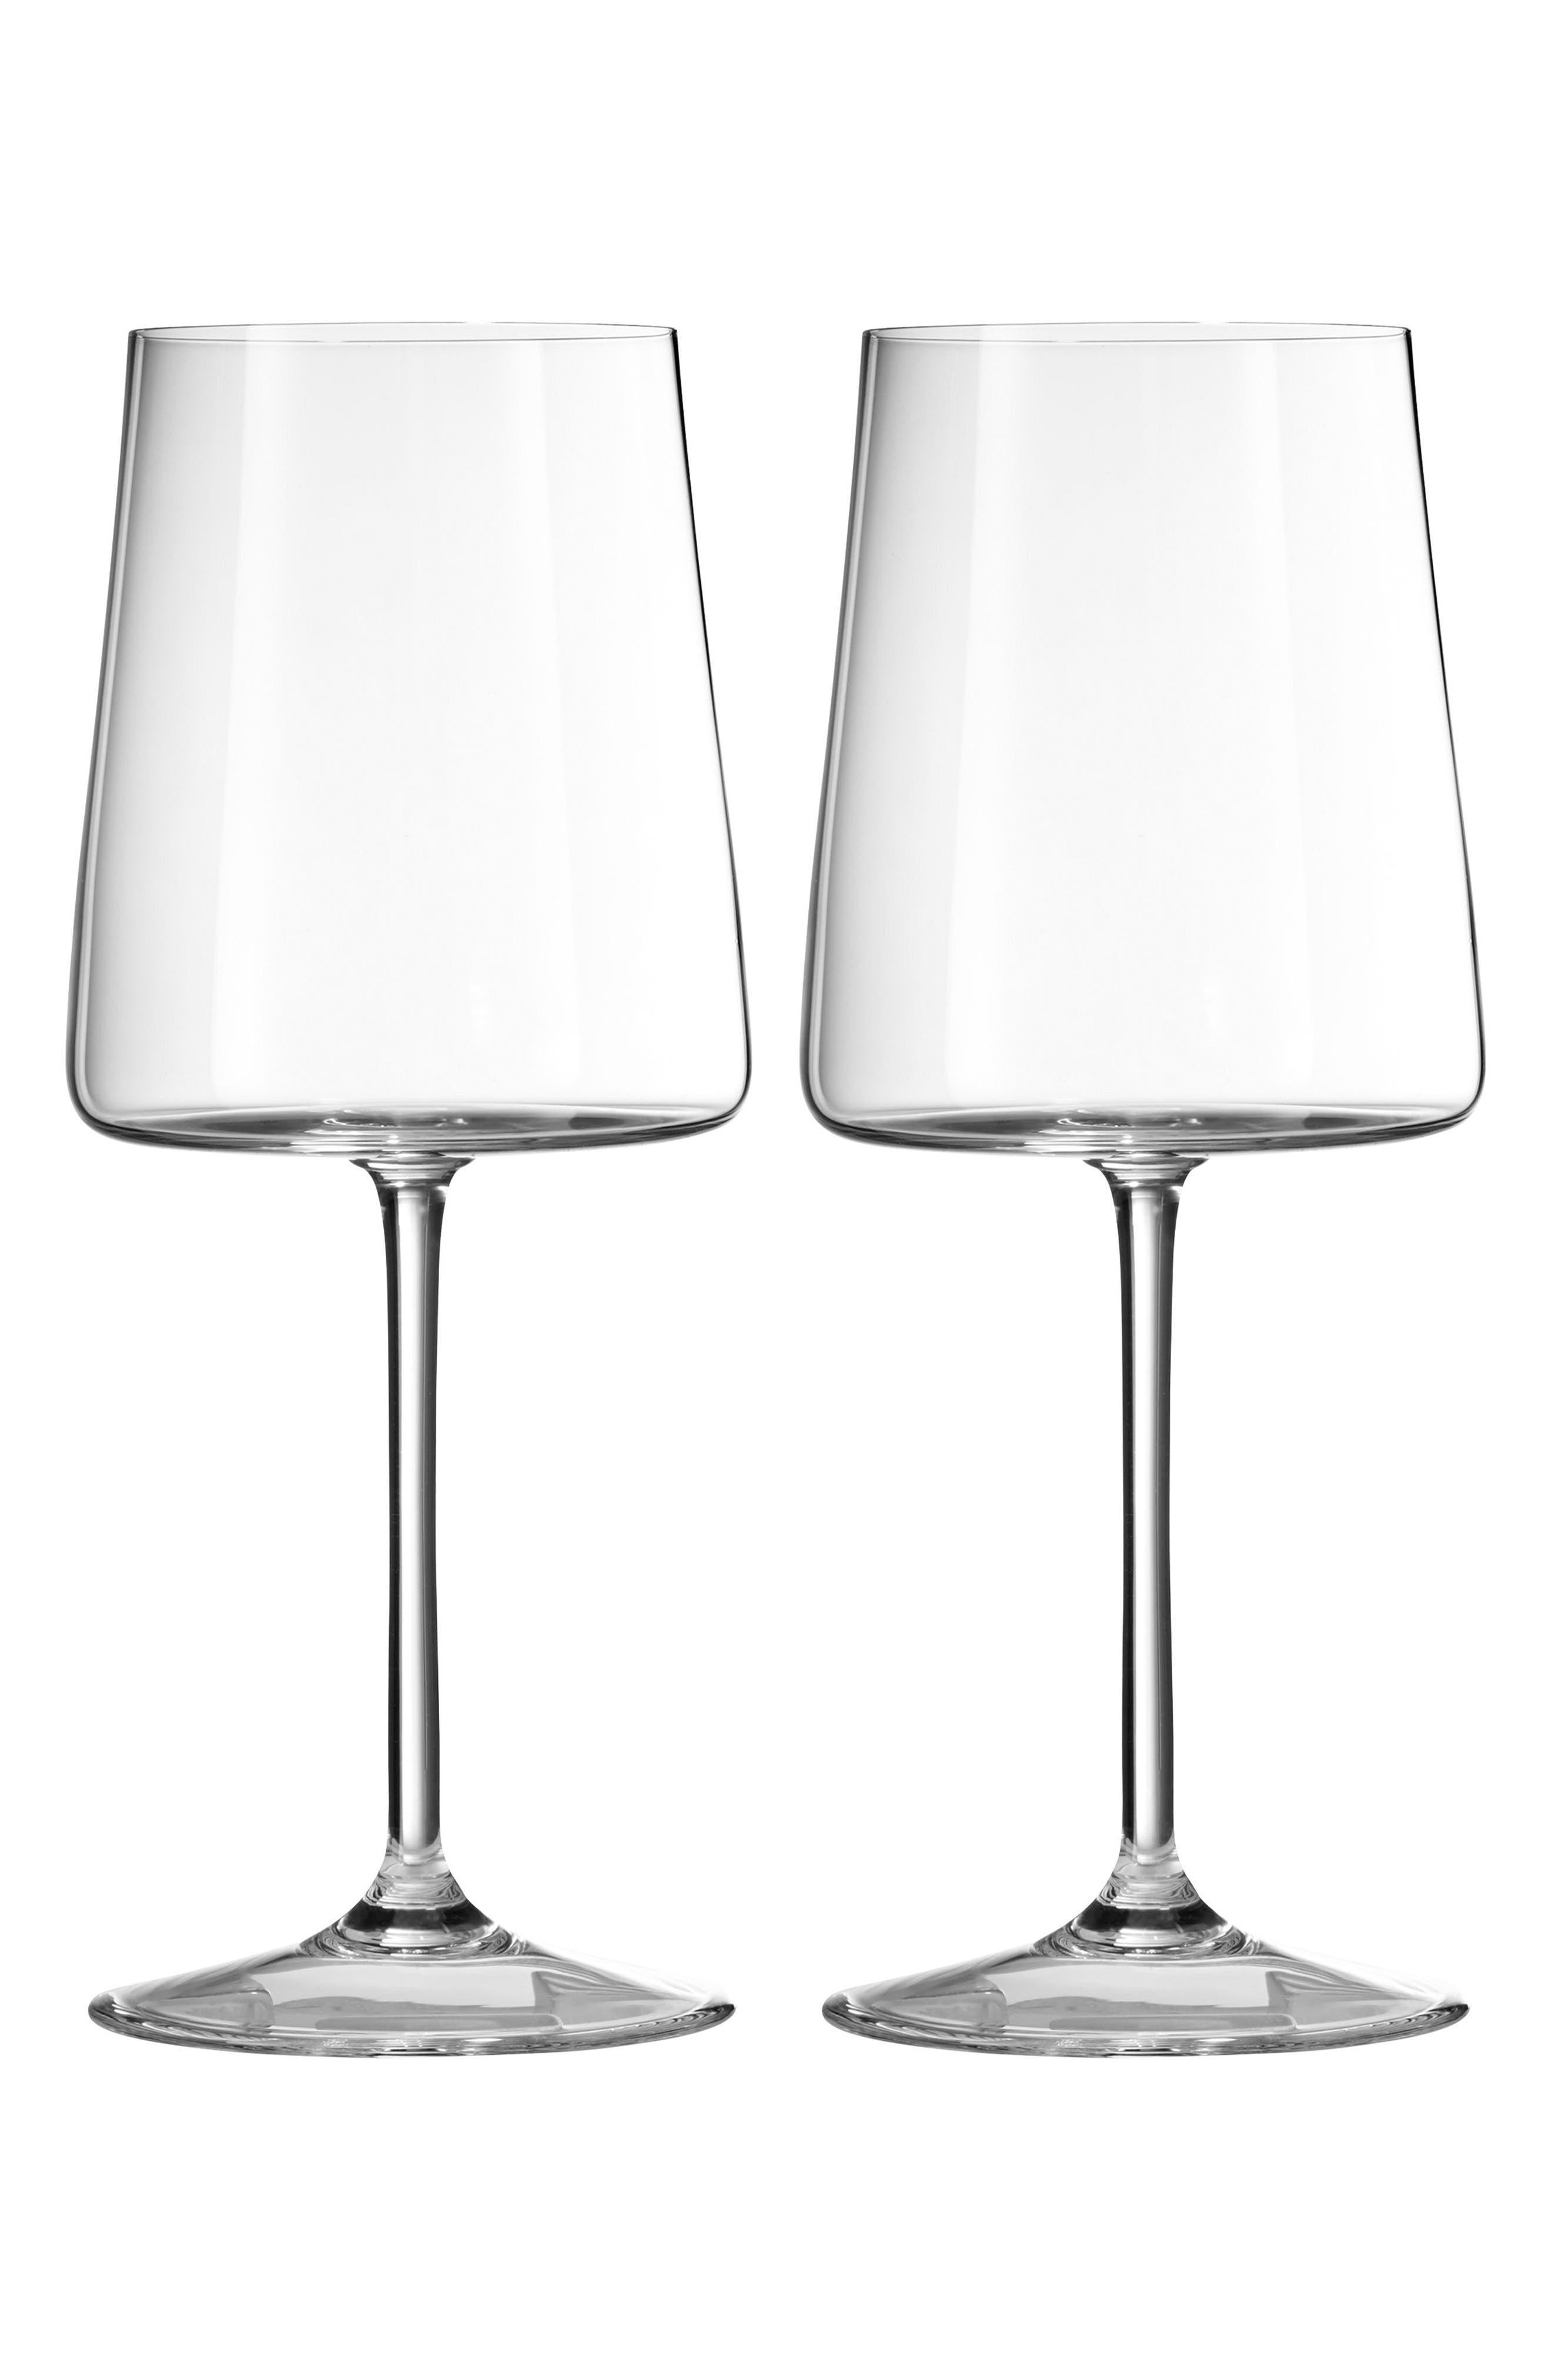 Main Image - Vera Wang x Wedgwood Vera Metropolitan Set of 2 Goblets